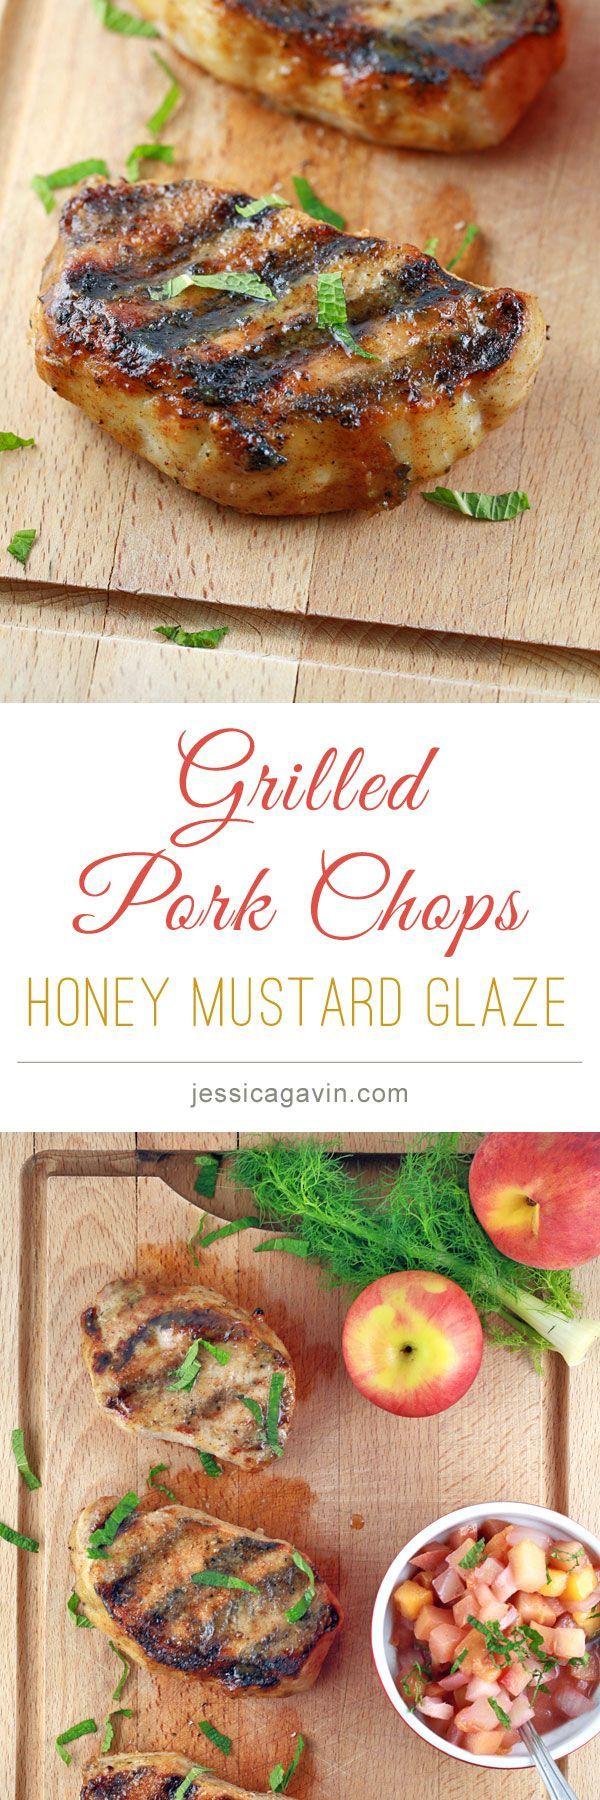 Super delicious Grilled Pork Chops recipe served with honey mustard glaze.